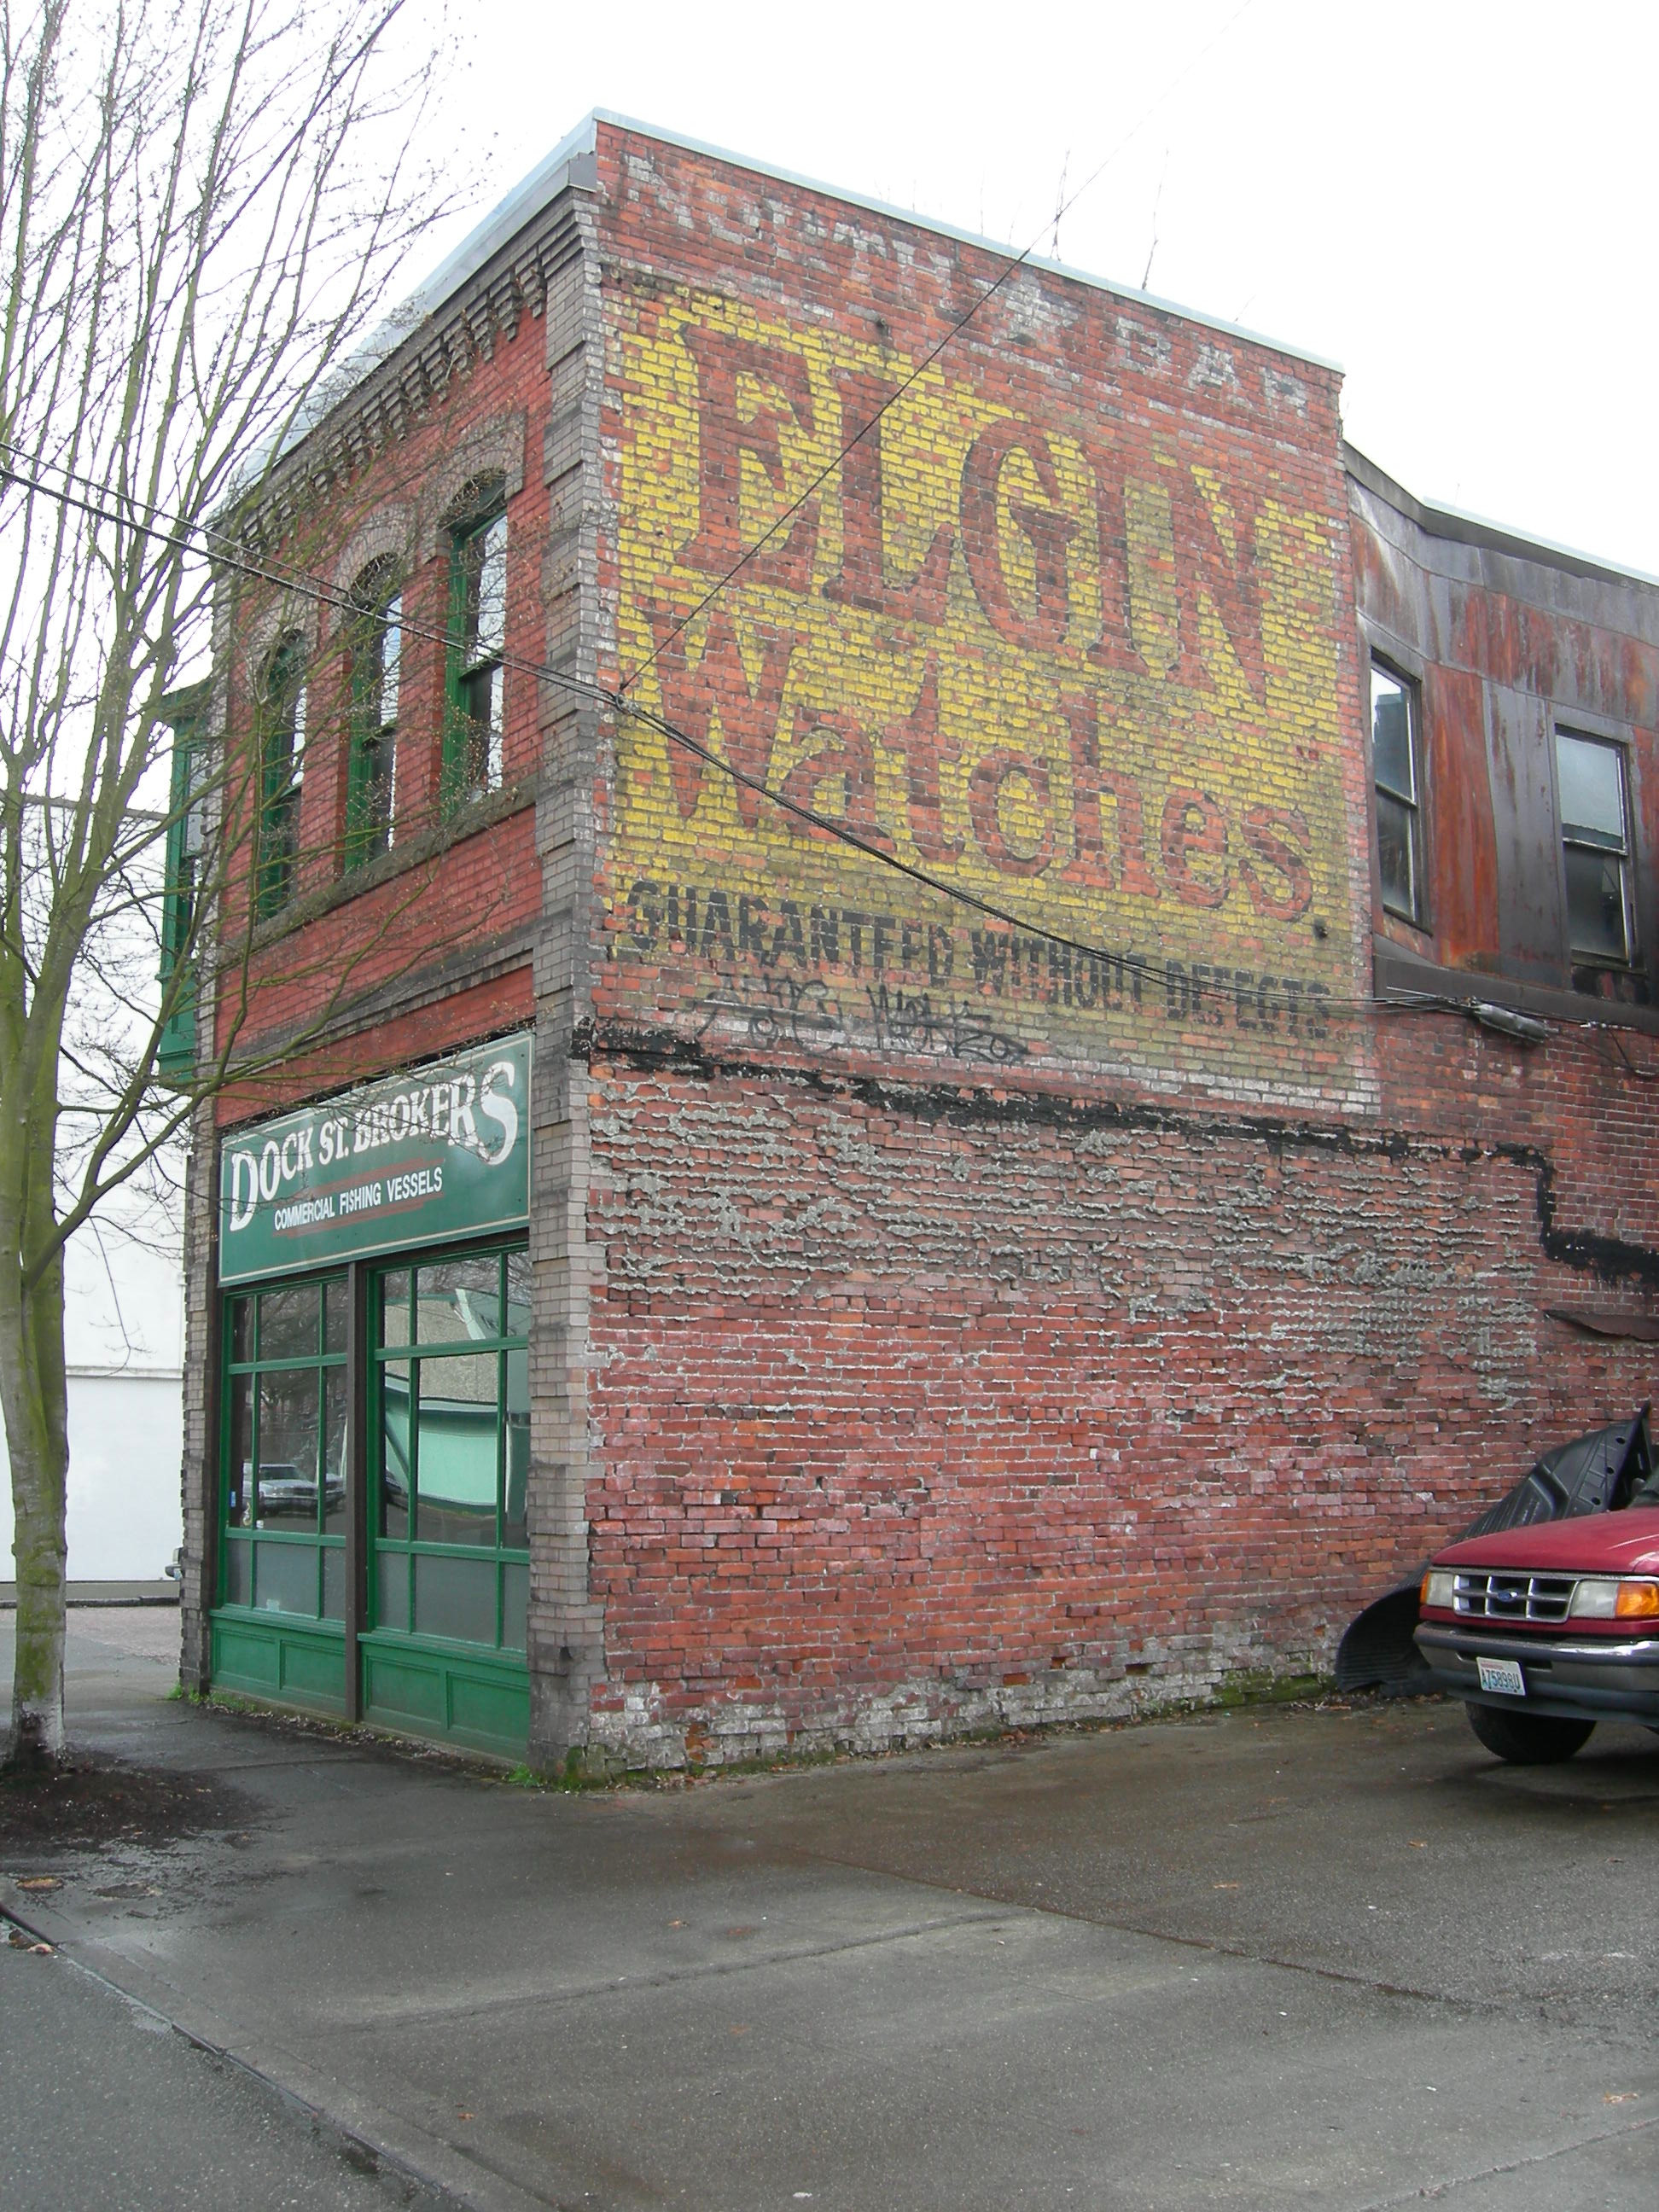 file:ballard - elgin watches - wikimedia commons